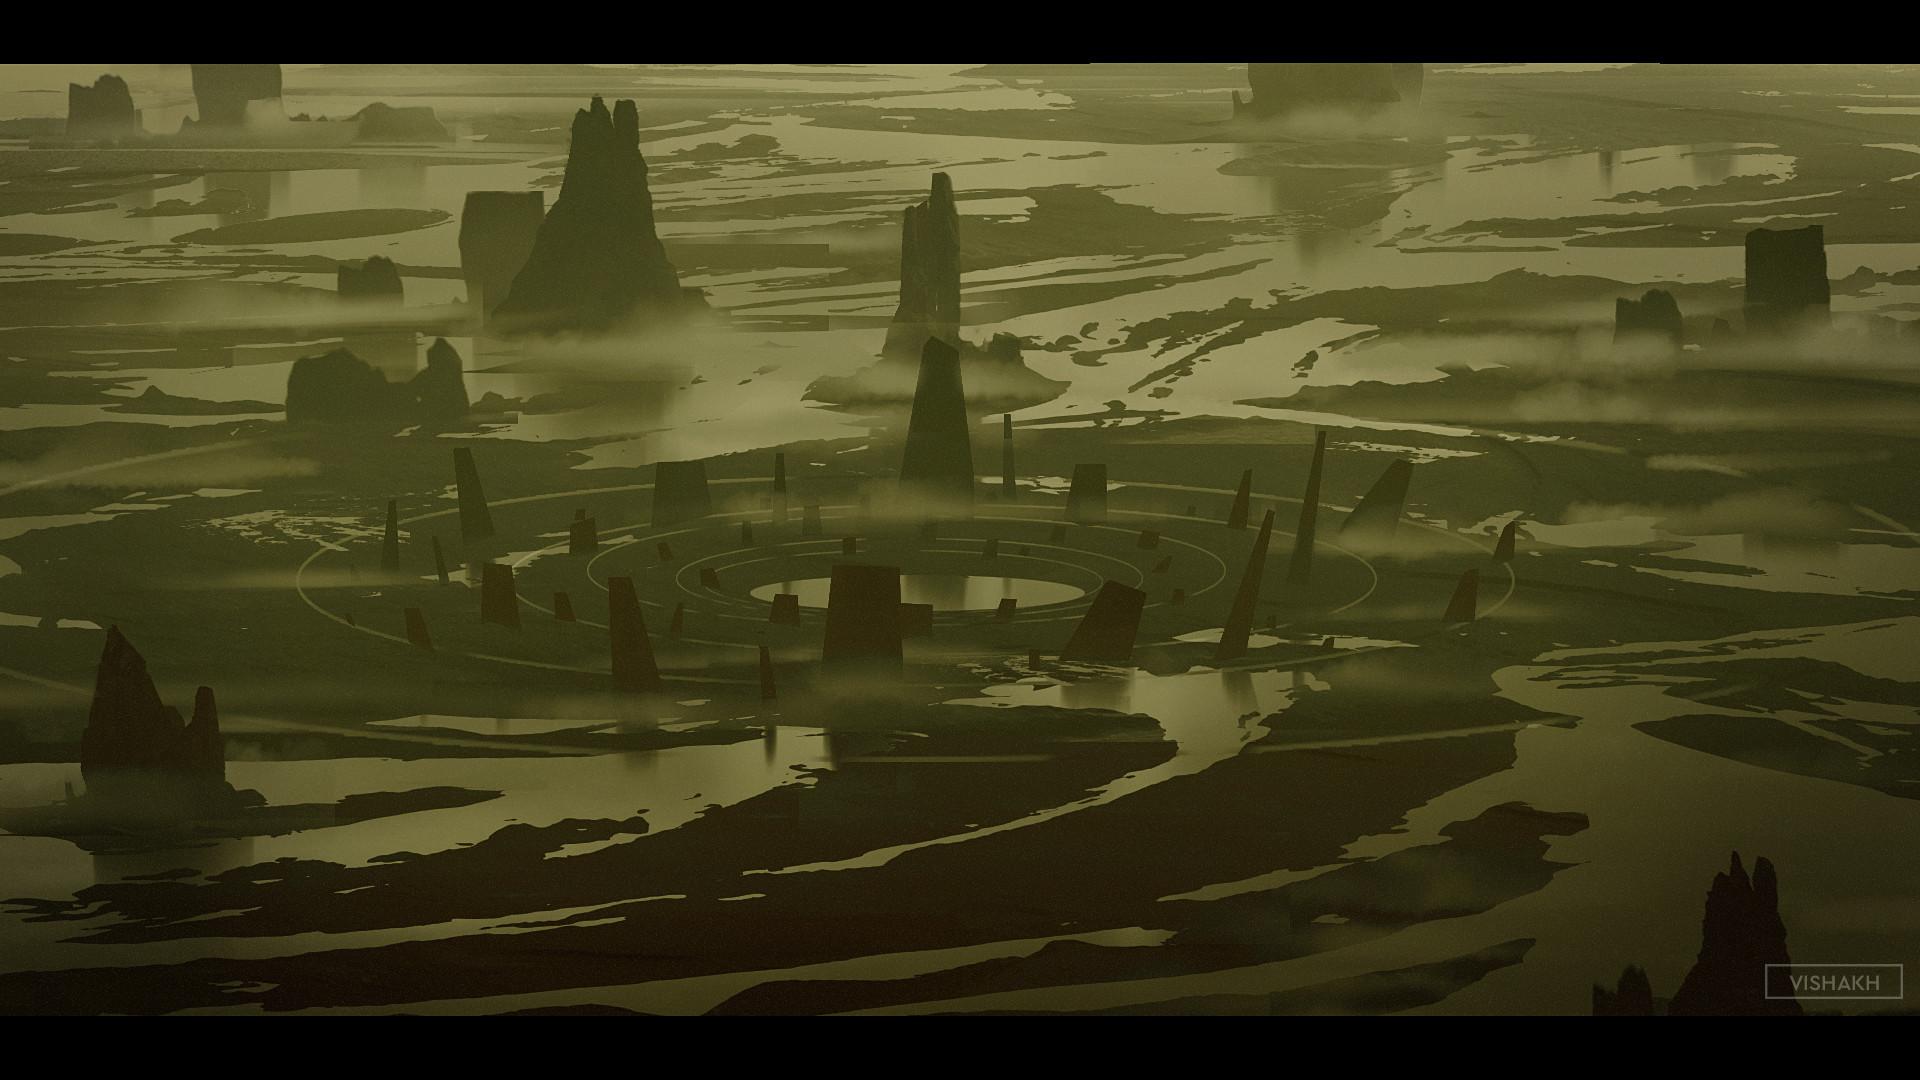 Vishakh Mohan Shadow Realm Exploration 01